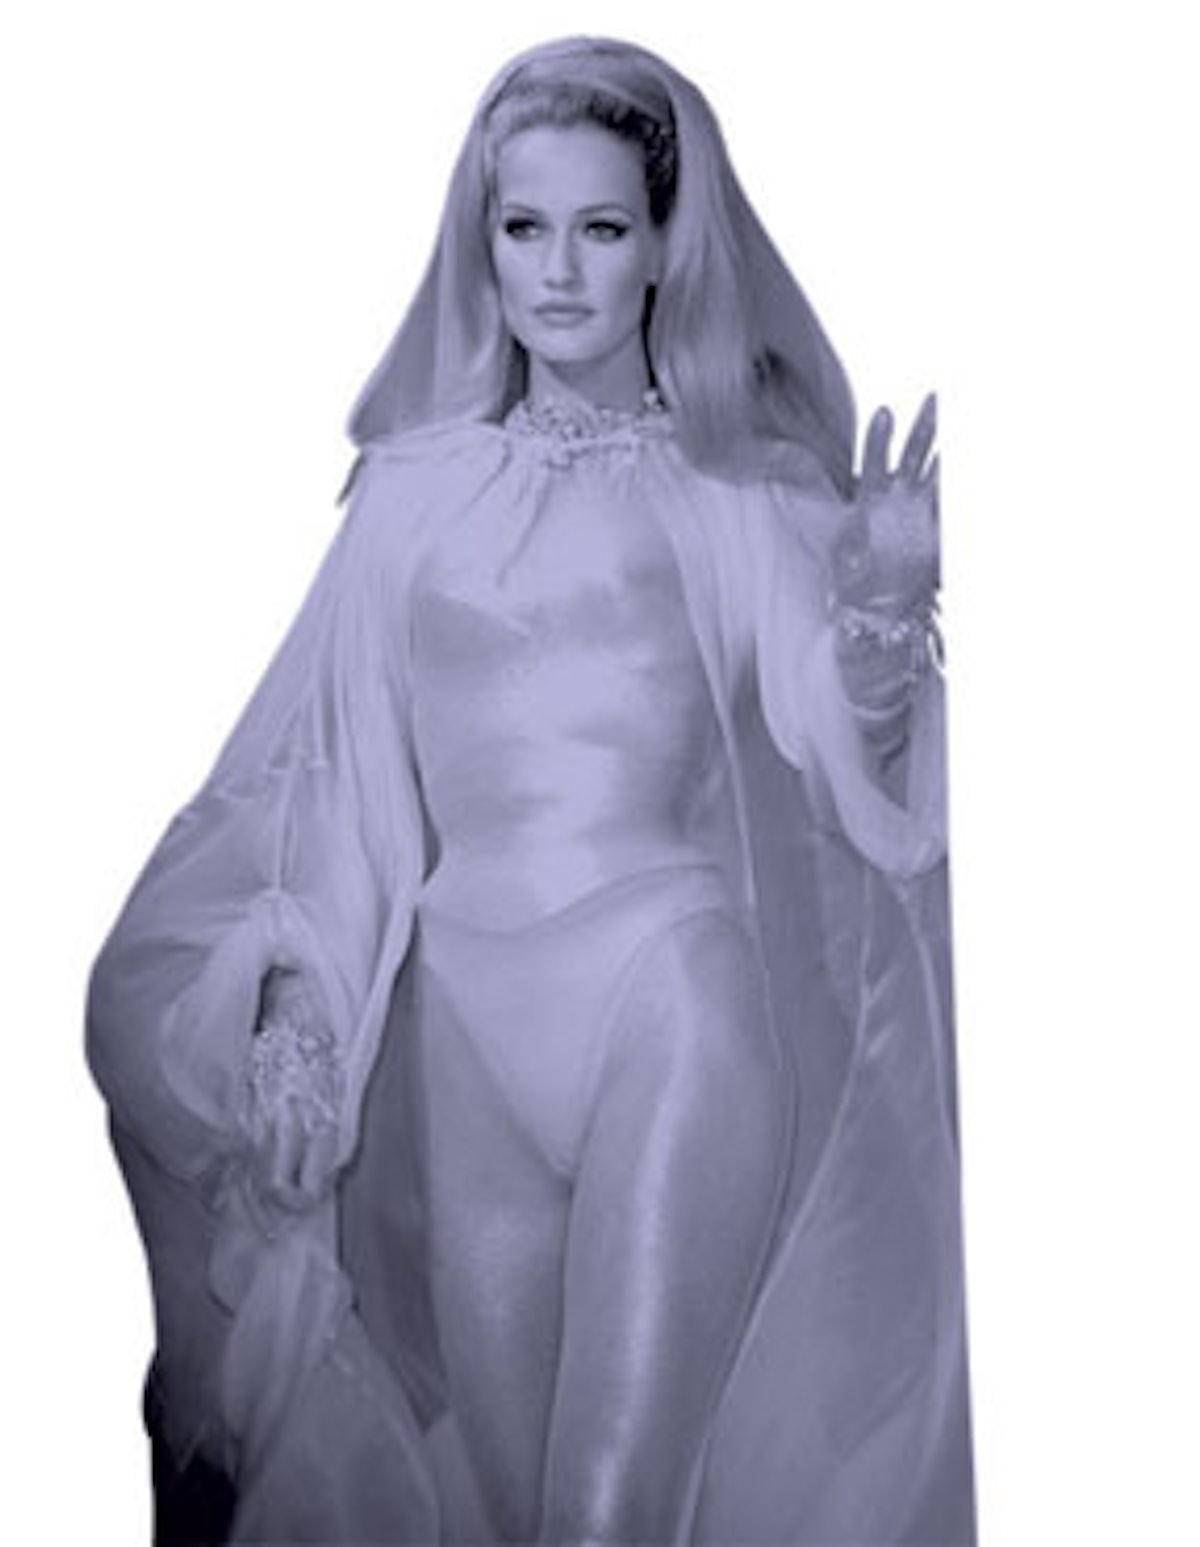 faar-fashion-scandals-40-years-14.jpg